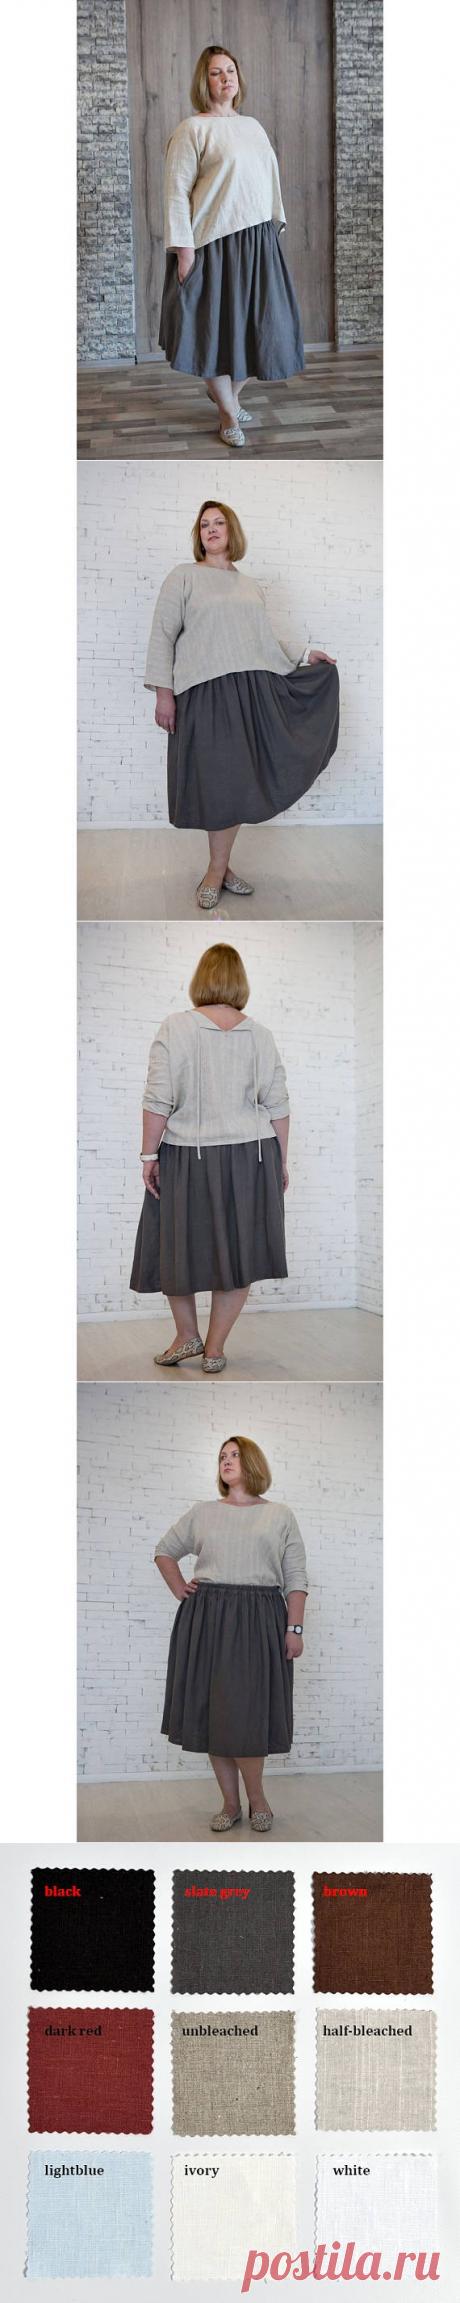 Medium length skirt Linen Loose washed linen SkirtPlus size